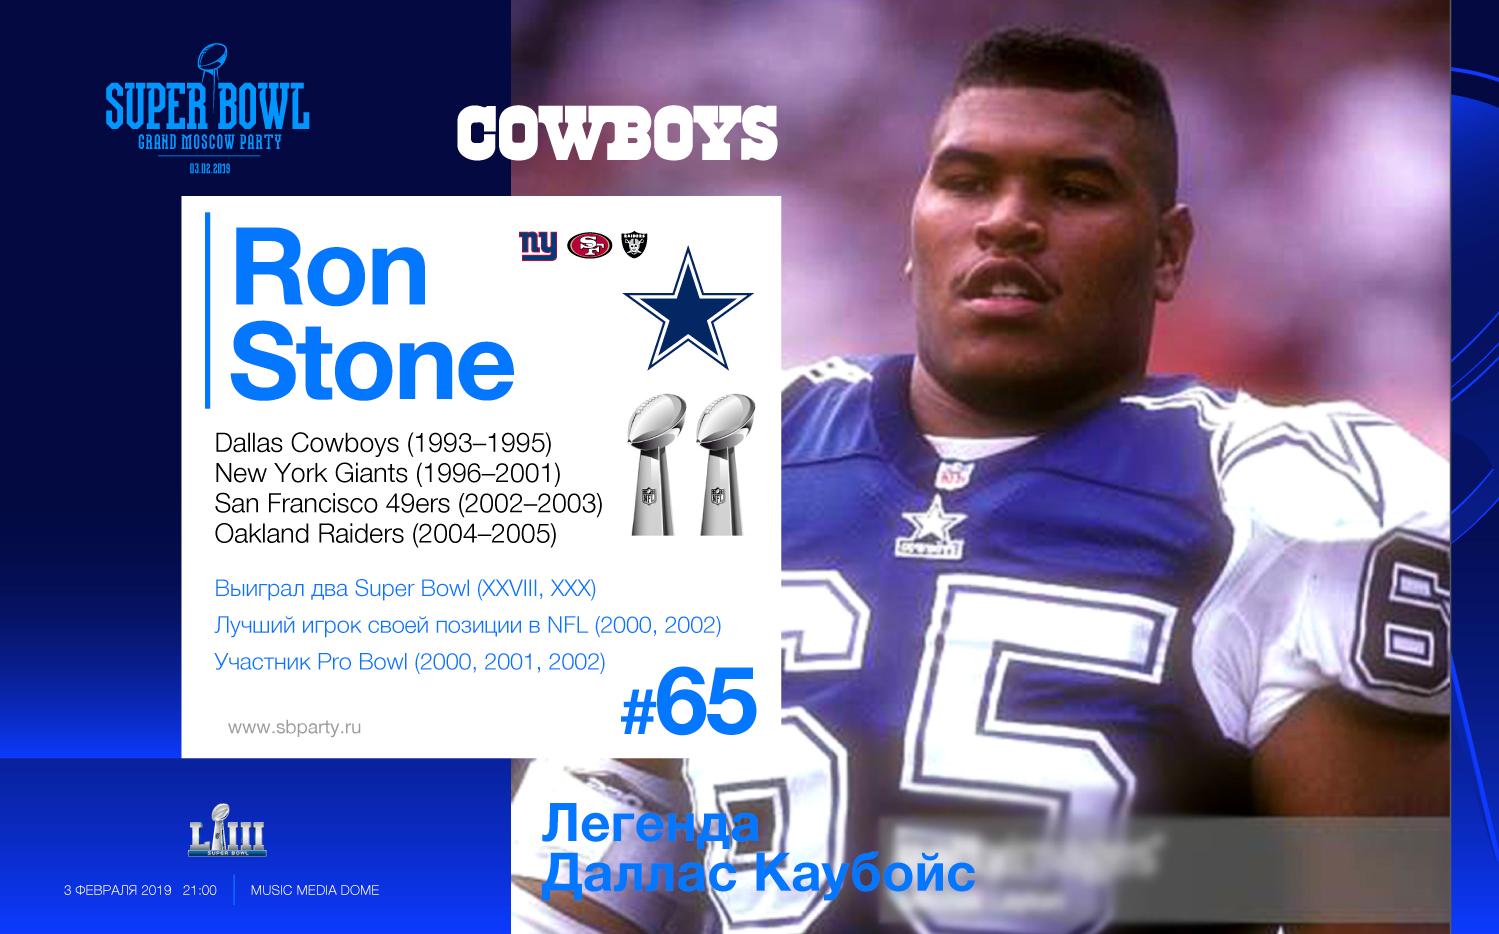 Ron-Stone-01.jpg